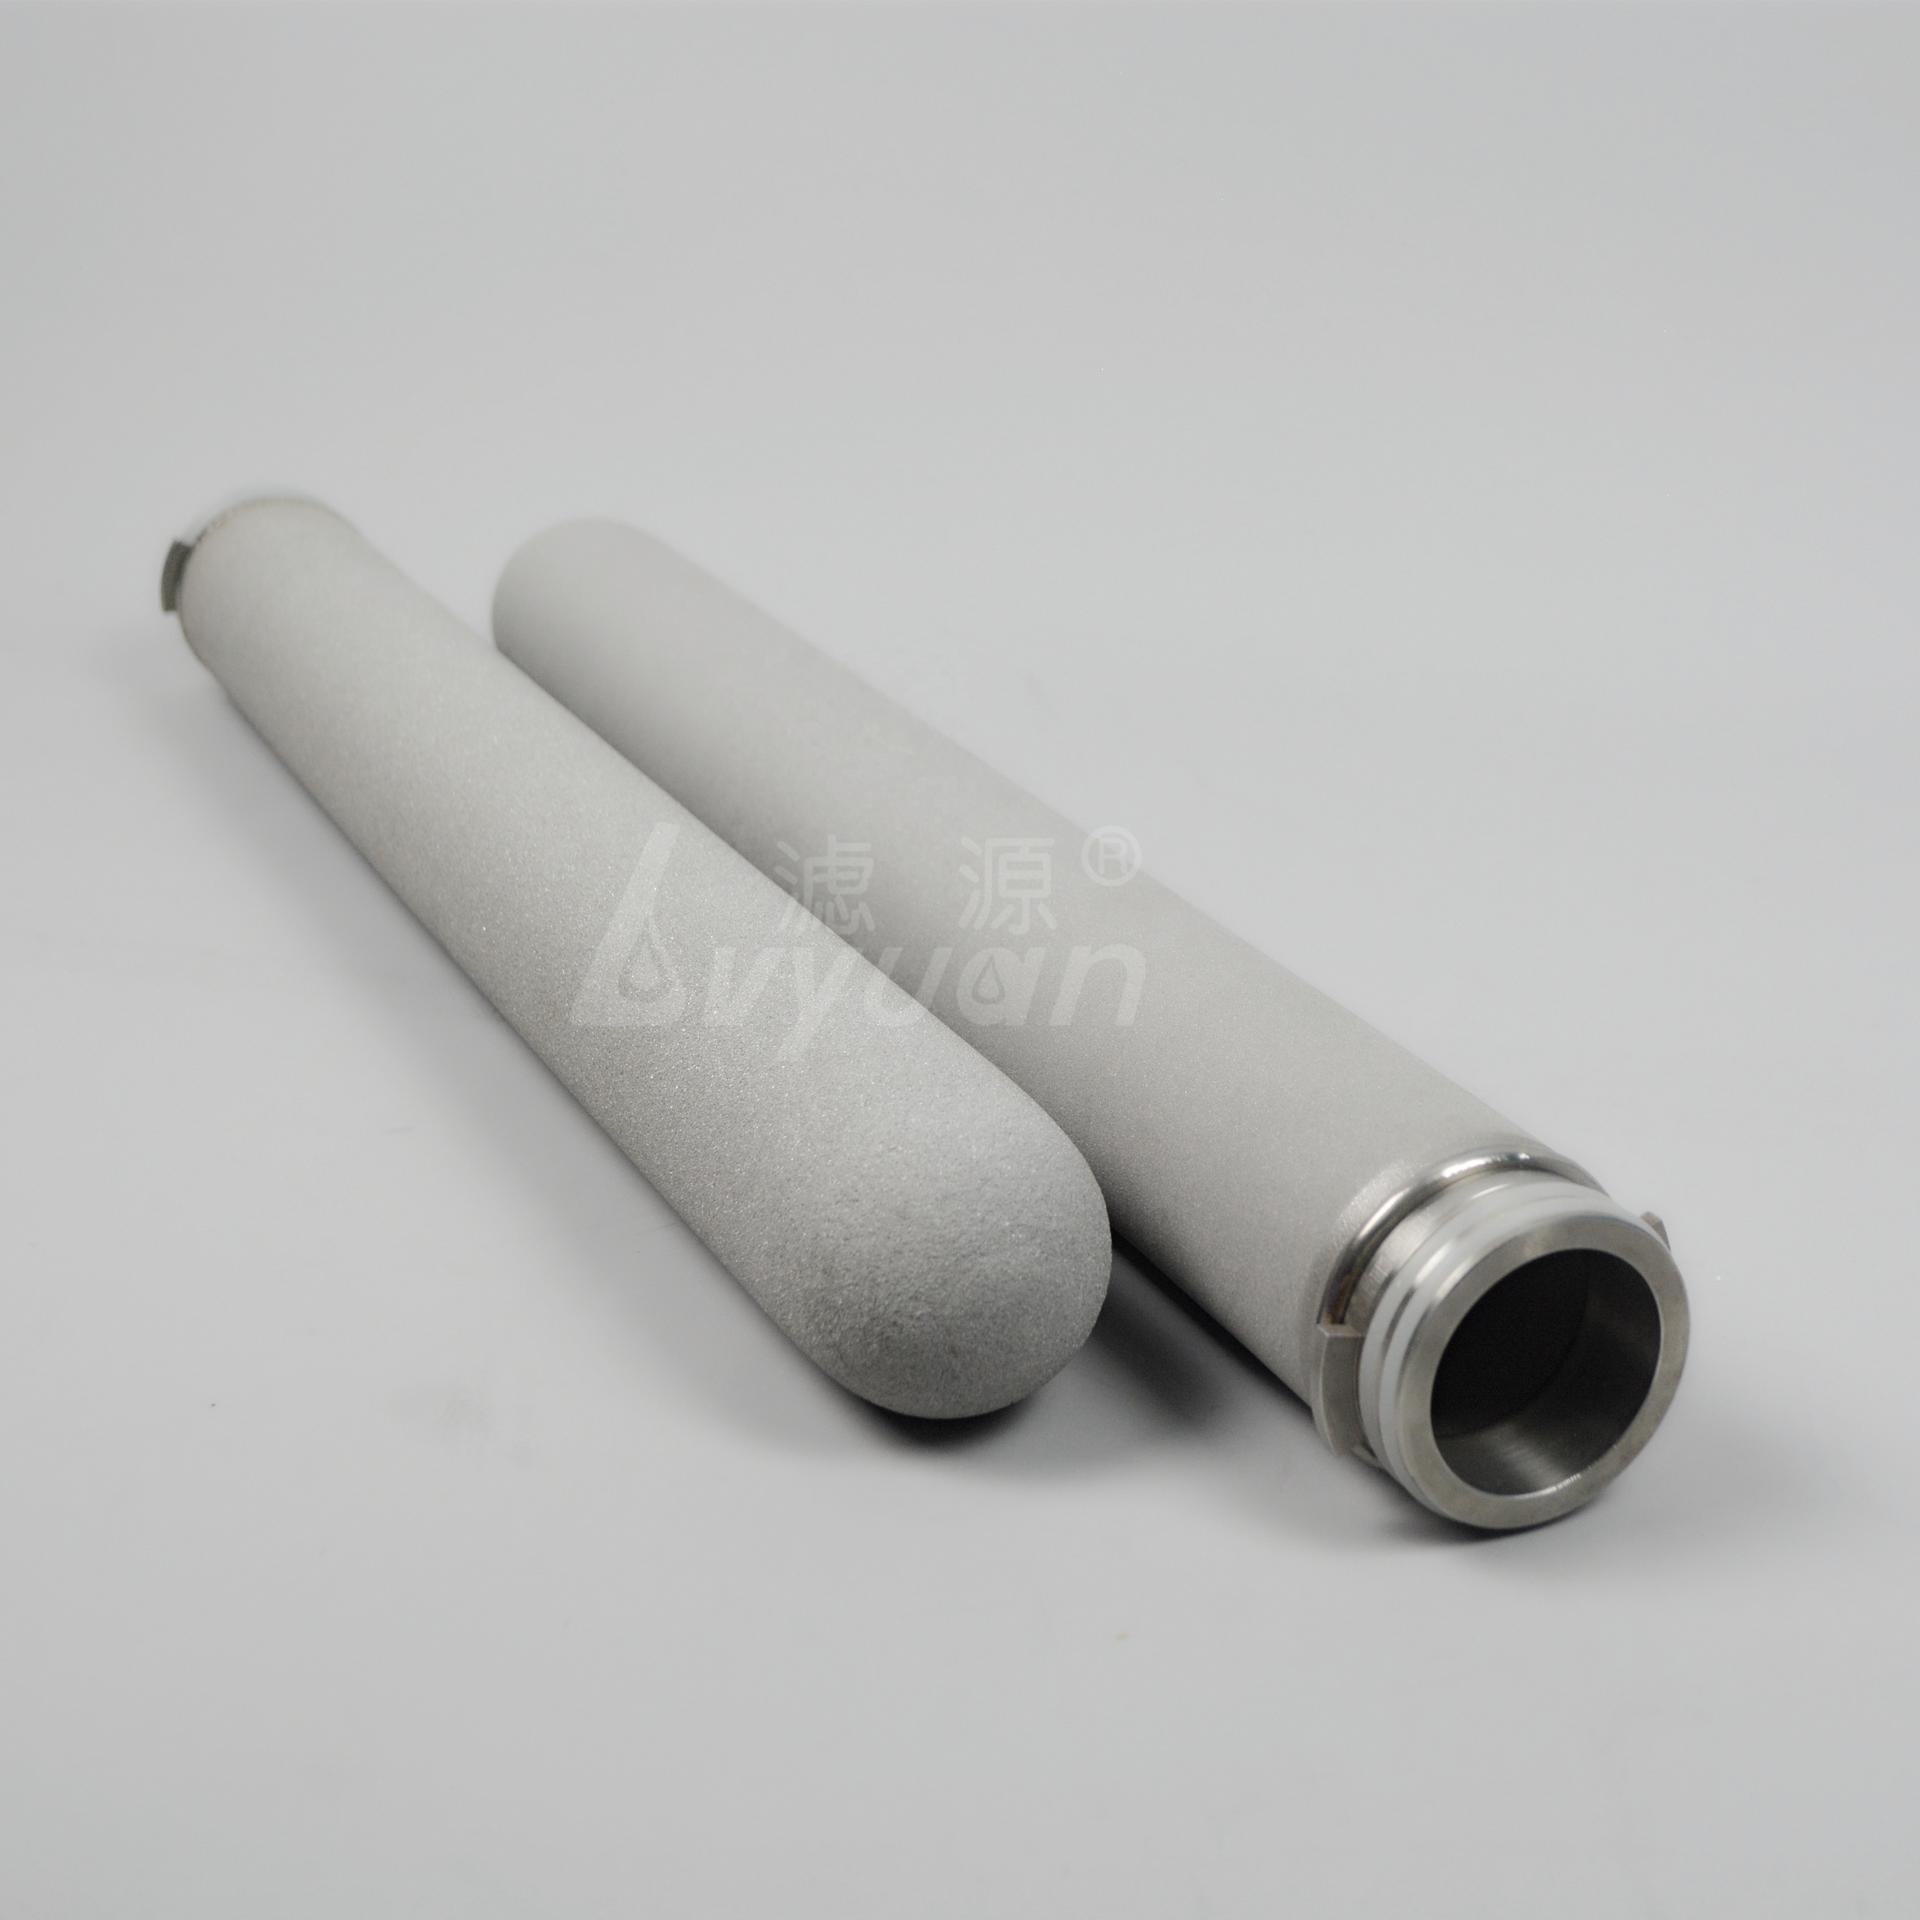 5'' 10 20 30 40 inch porous titanium filter /sintered titanium rod water filter cartridge for filtration